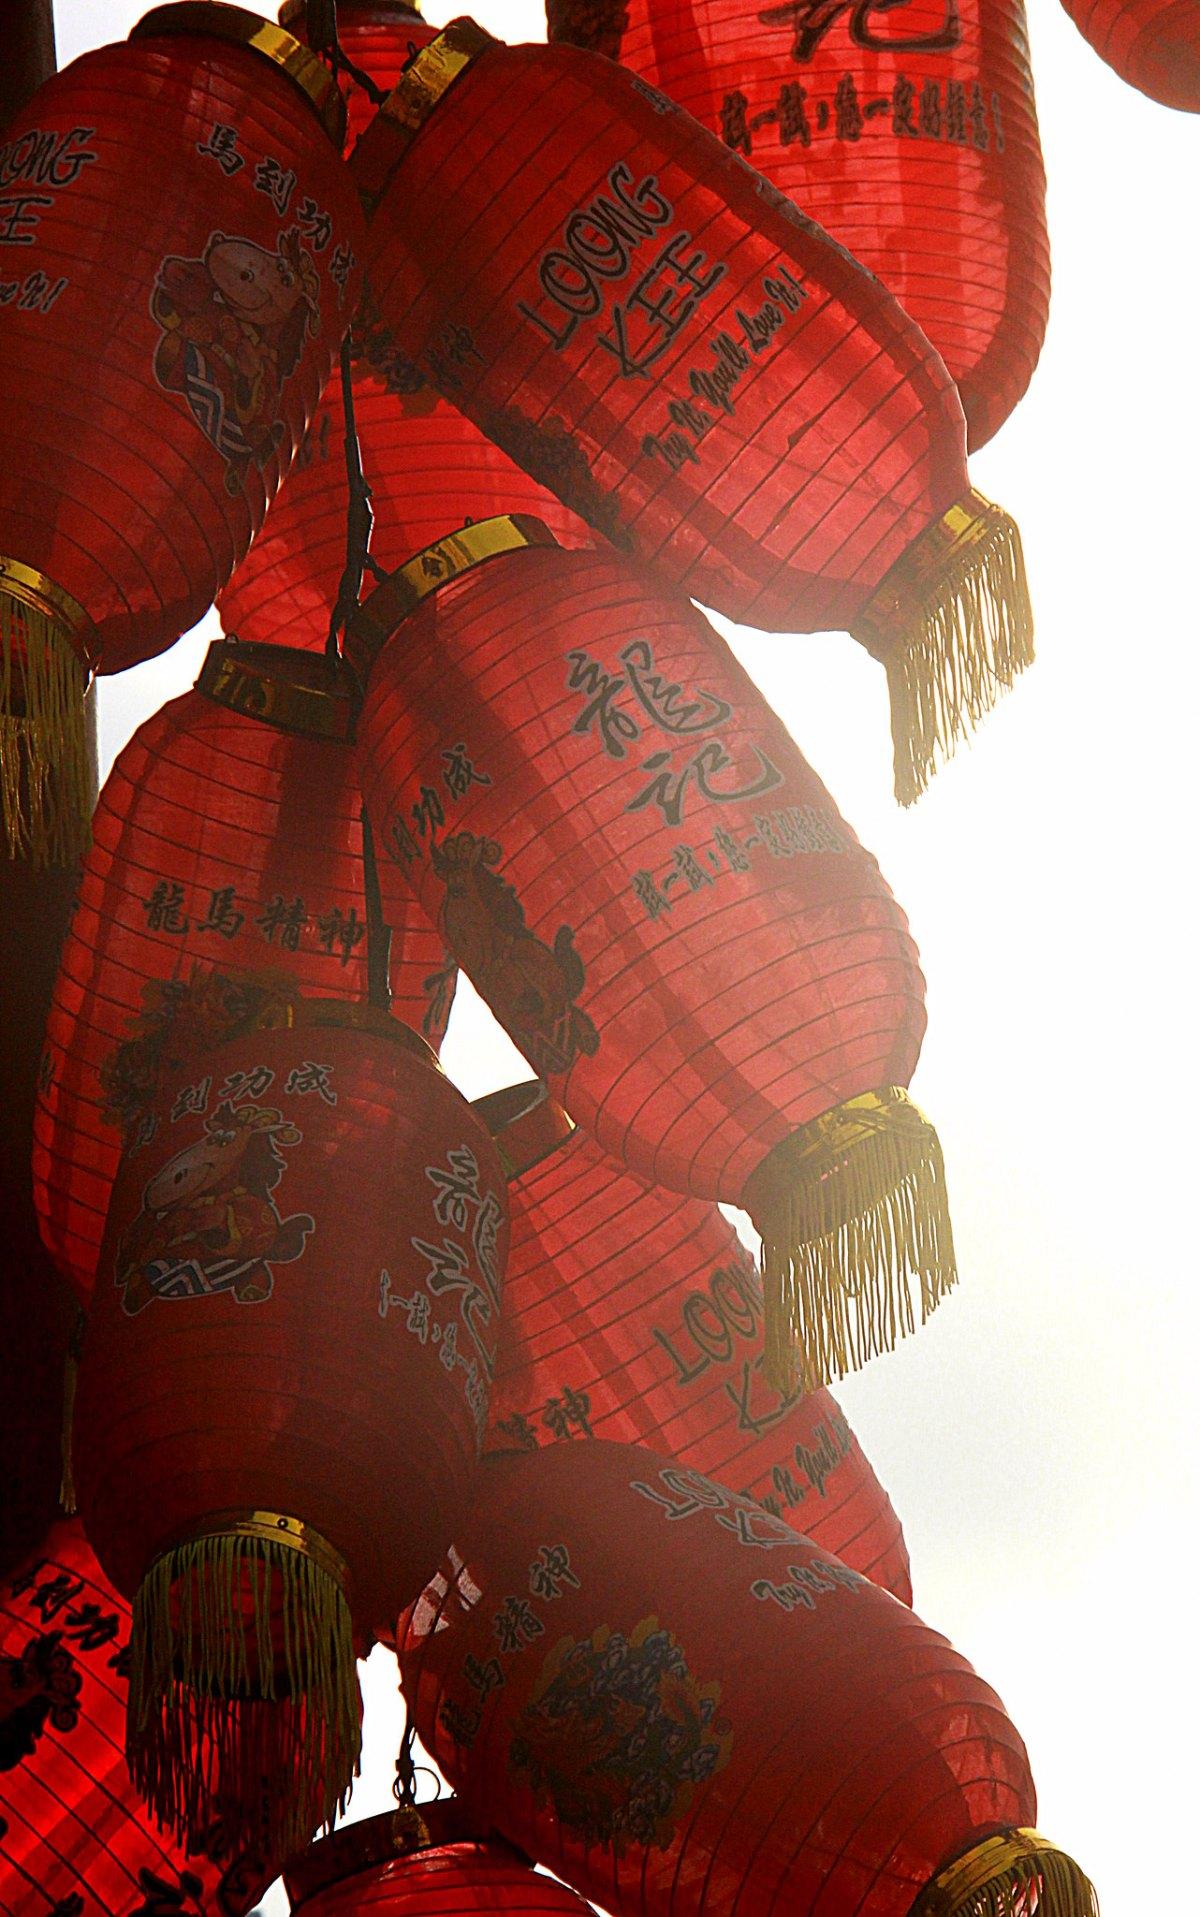 Historic Chinatown in Kuala Lumpur